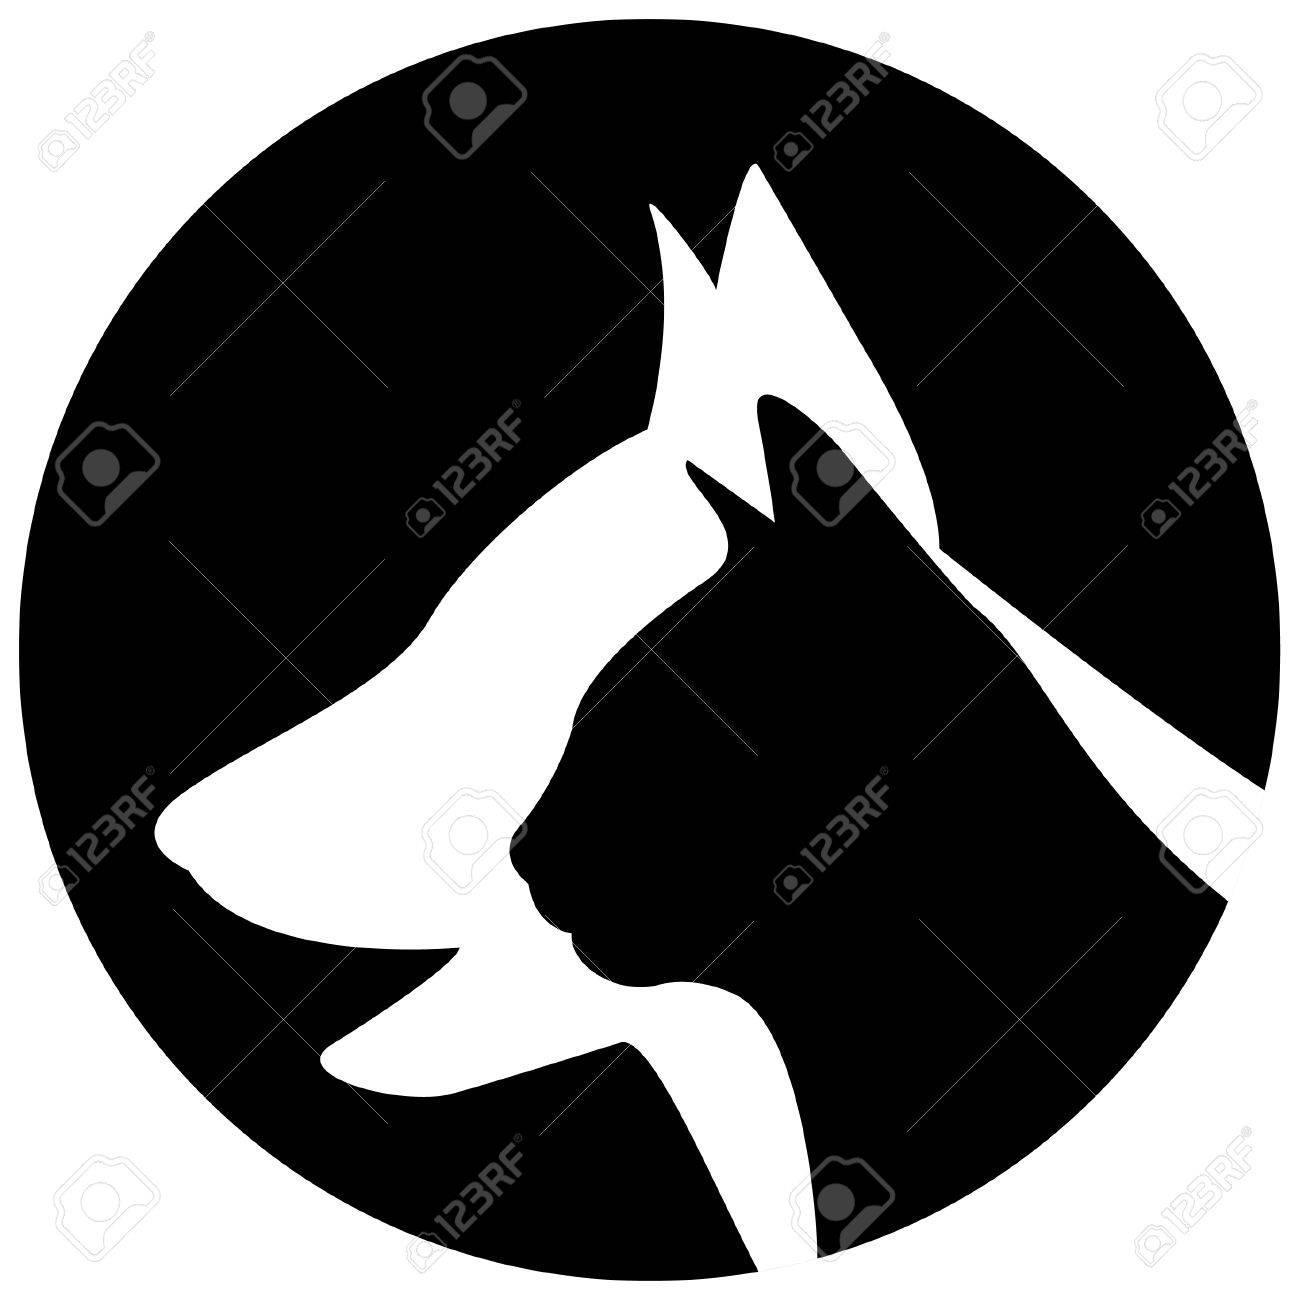 Veterinary logo Stock Vector - 3971198